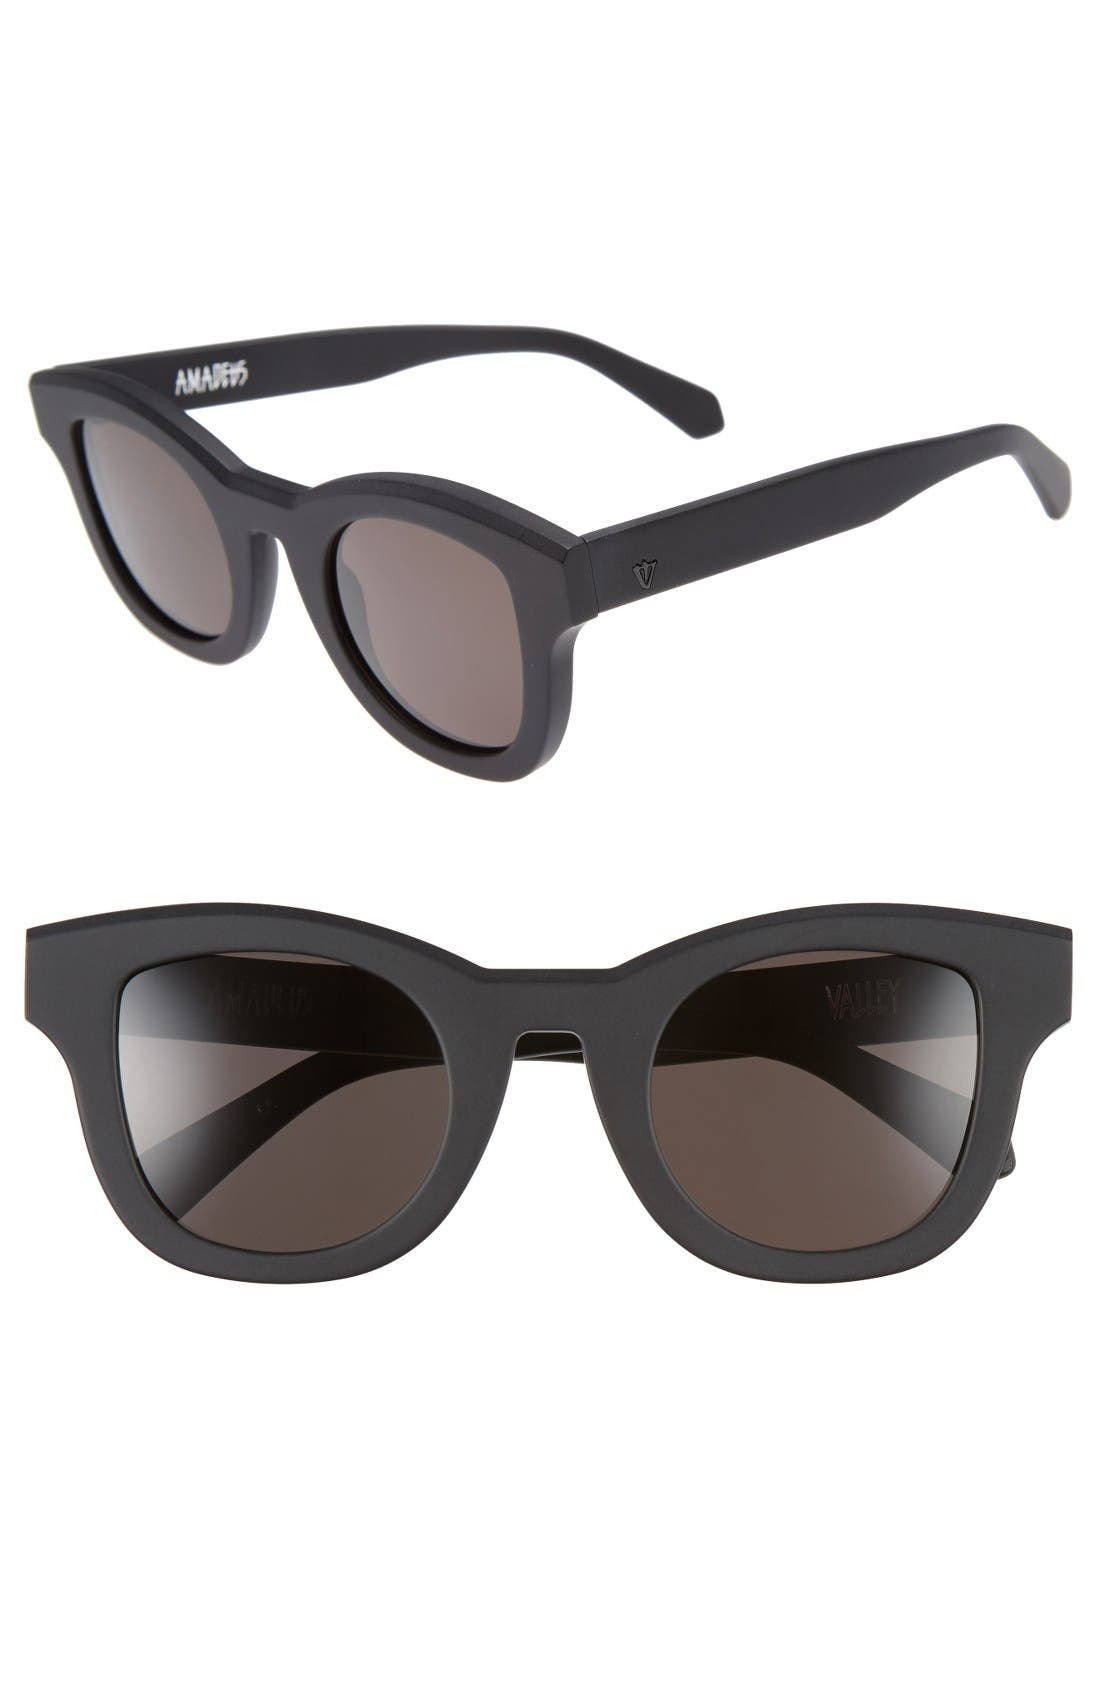 VALLEY Amadeus 48mm Retro Sunglasses